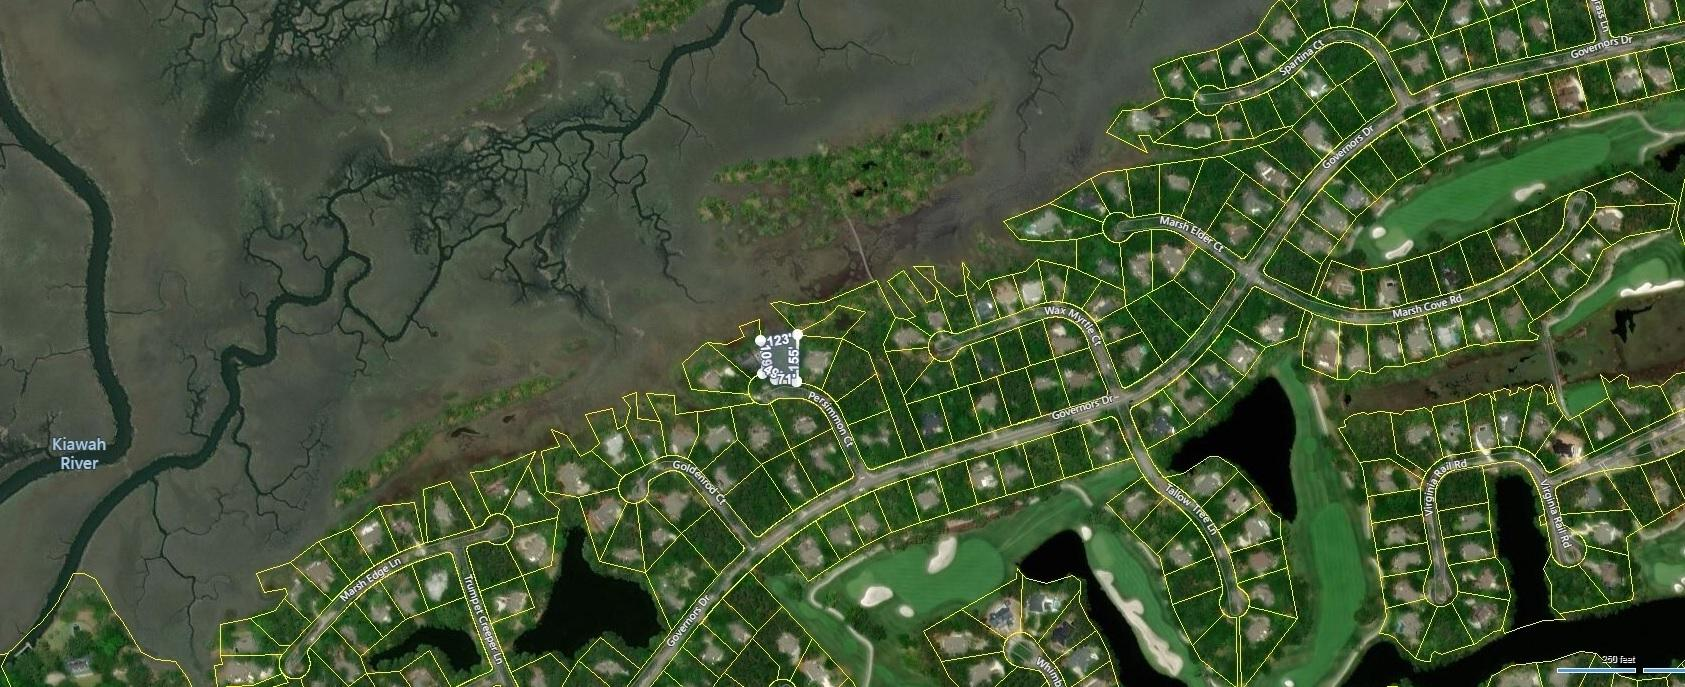 67 Persimmon Court Kiawah Island, SC 29455